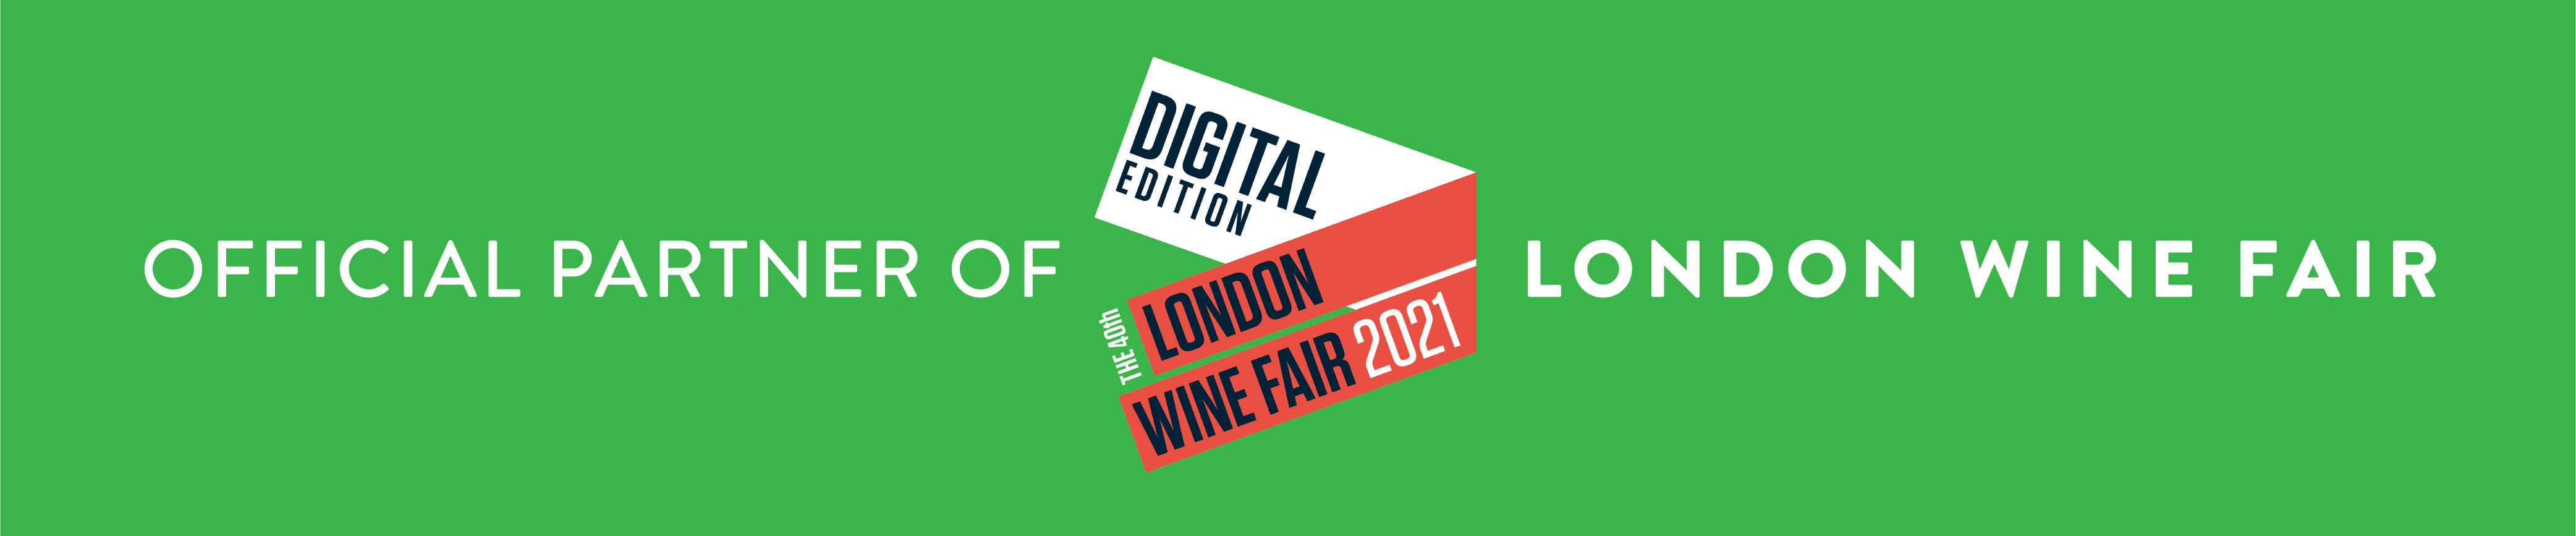 Official partner of London Wine Fair